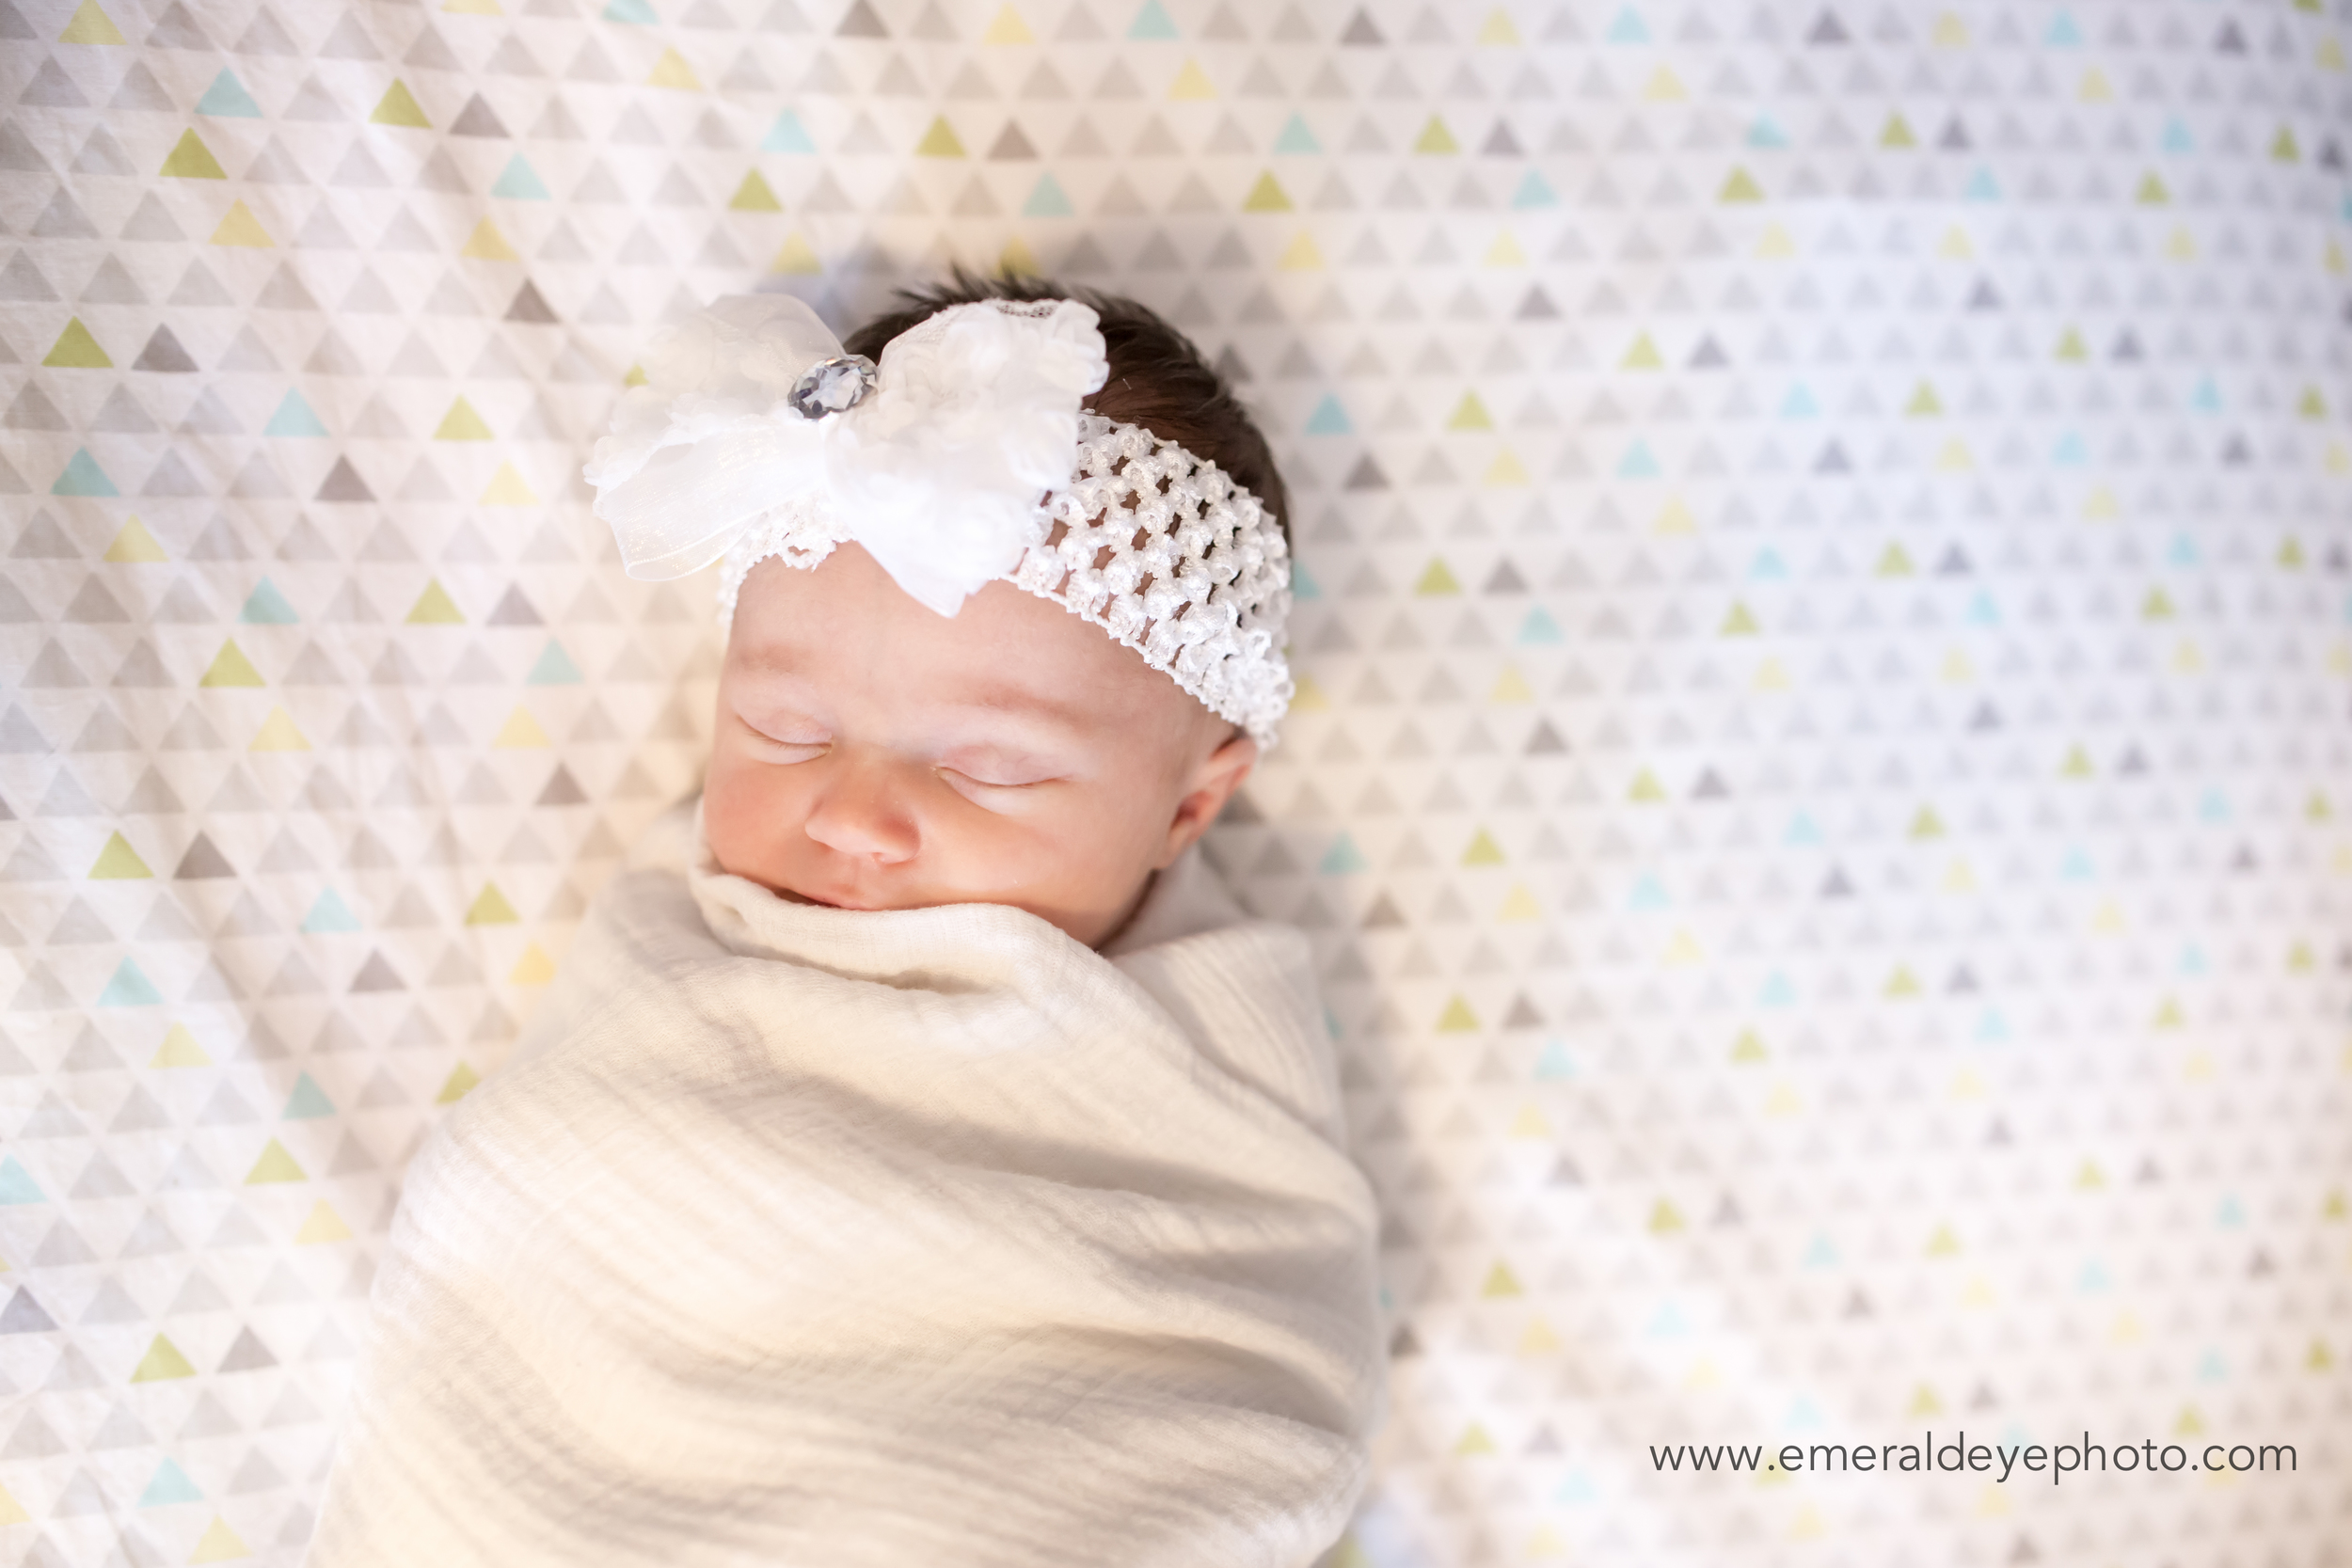 New baby girl sleeping in crib with bow in Boston Massachusetts